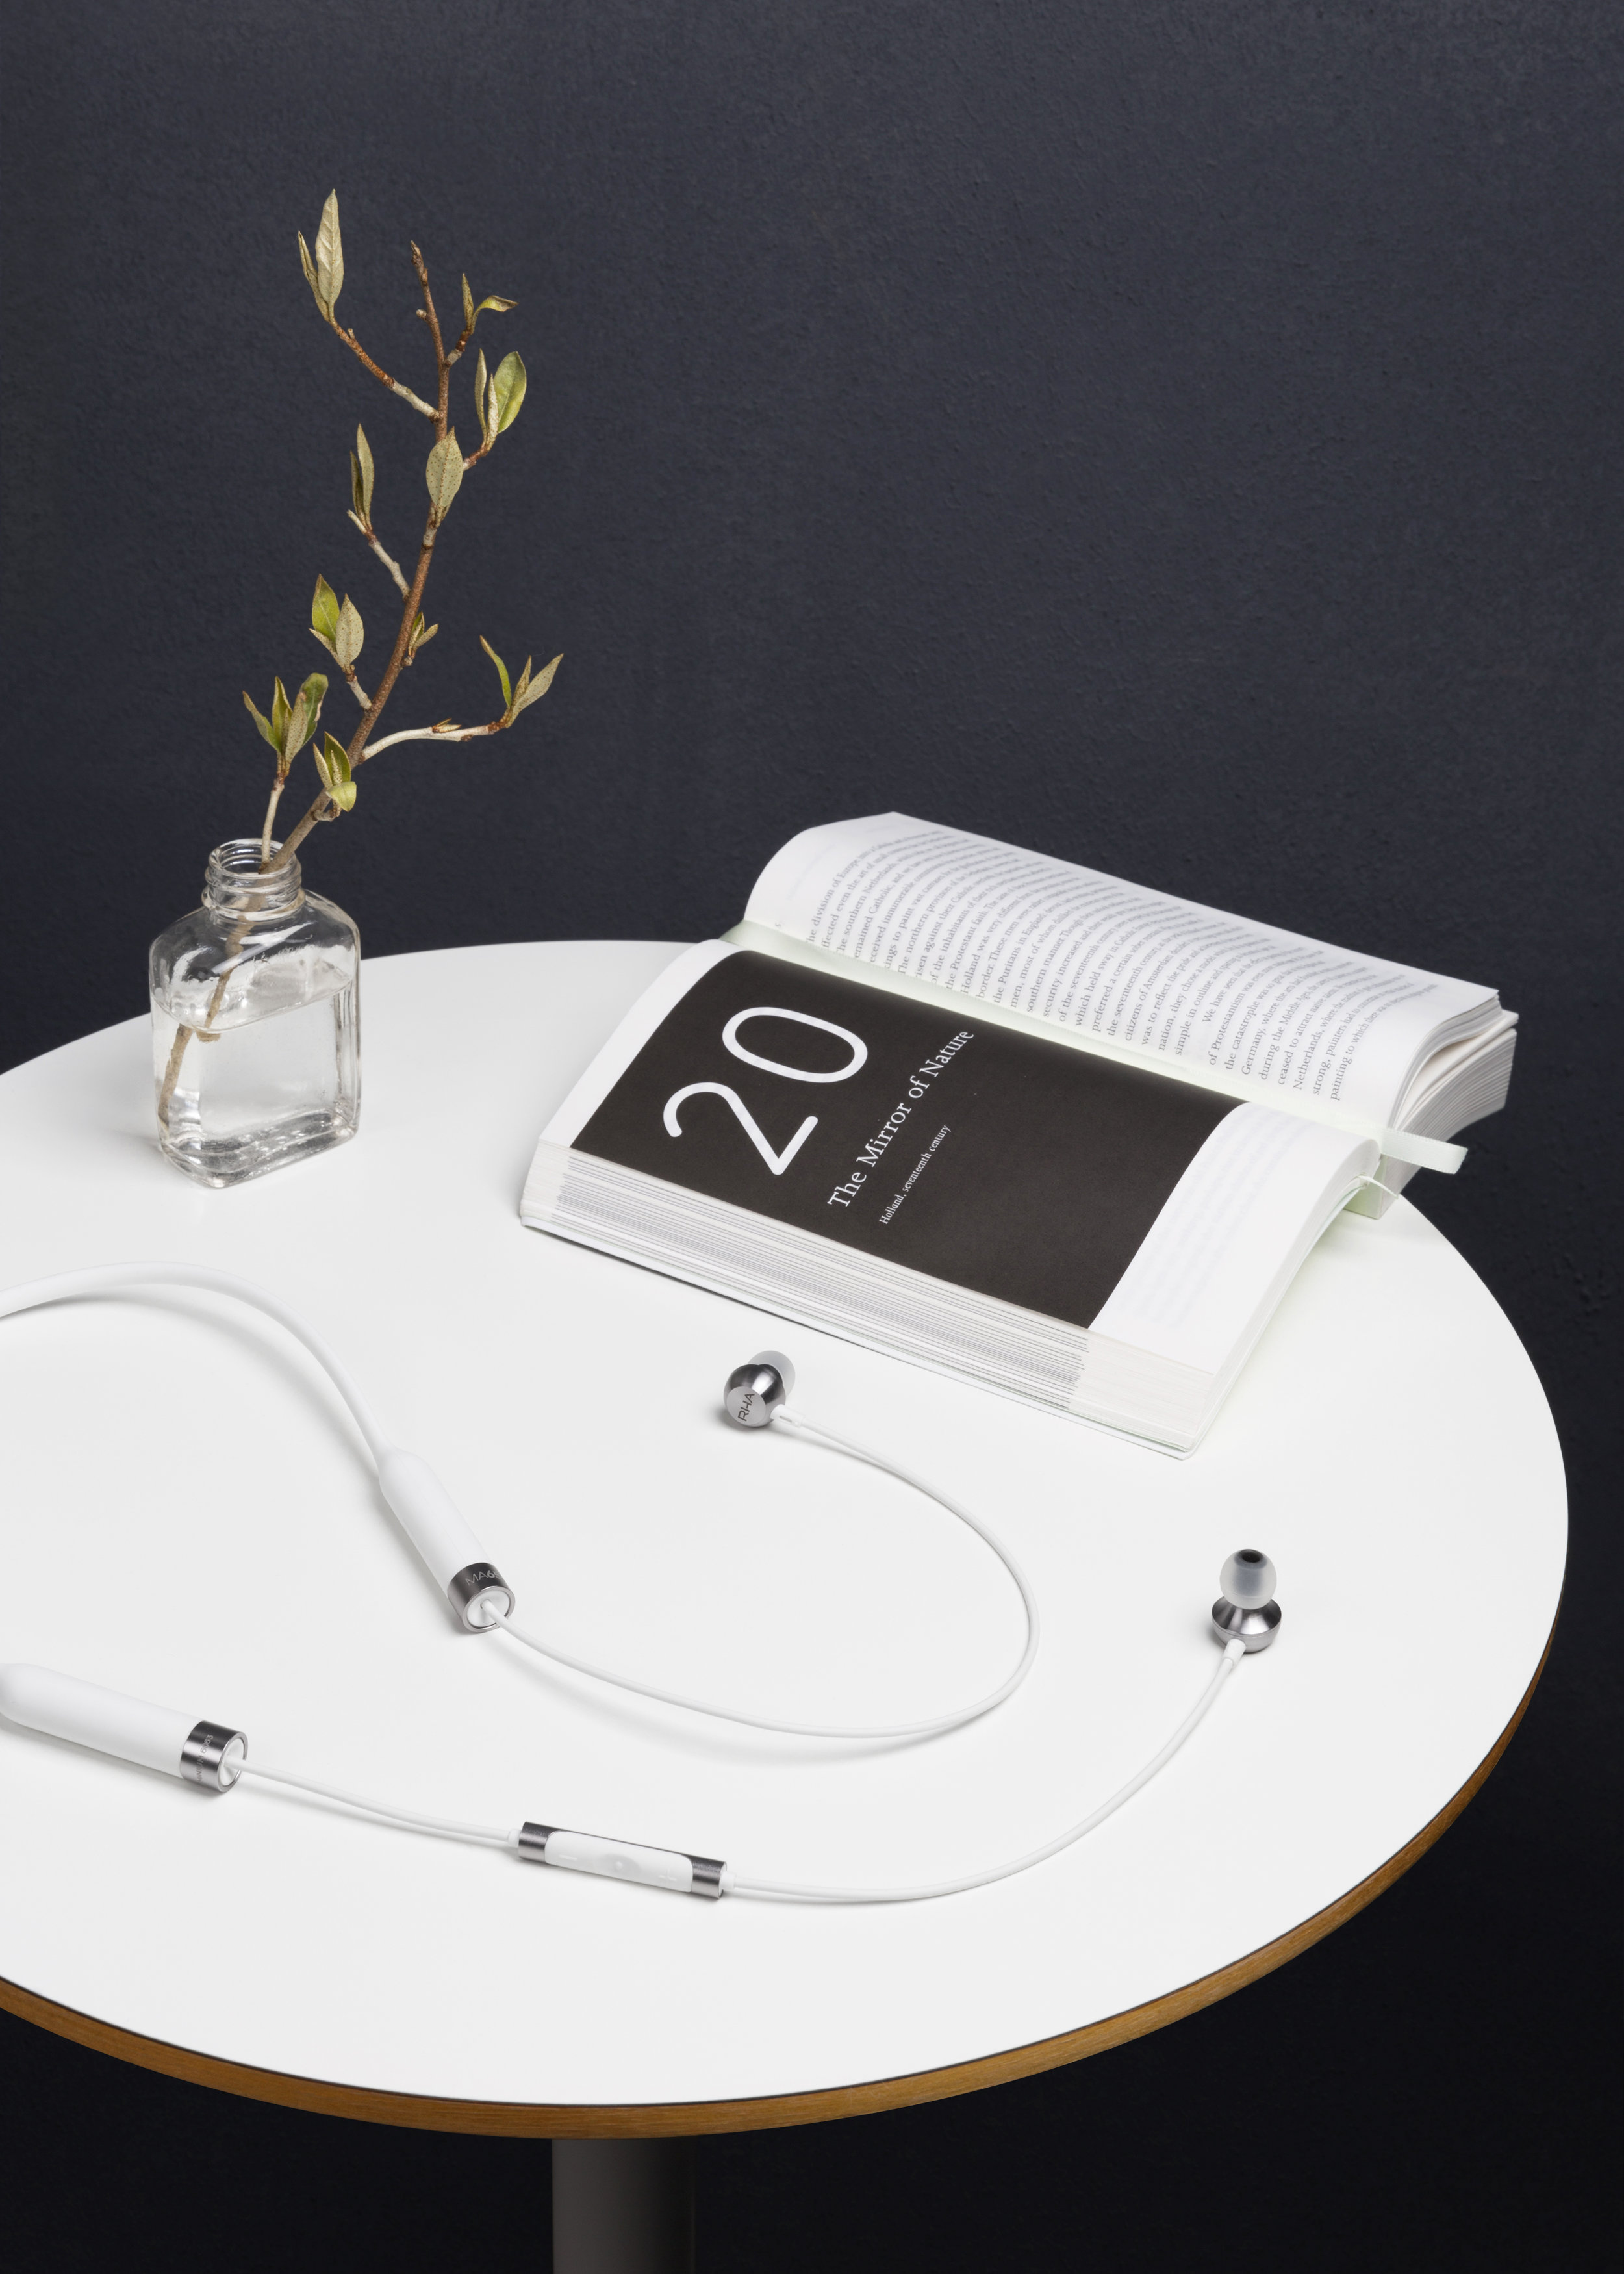 11. MA650 White Wireless - Home 2.jpg